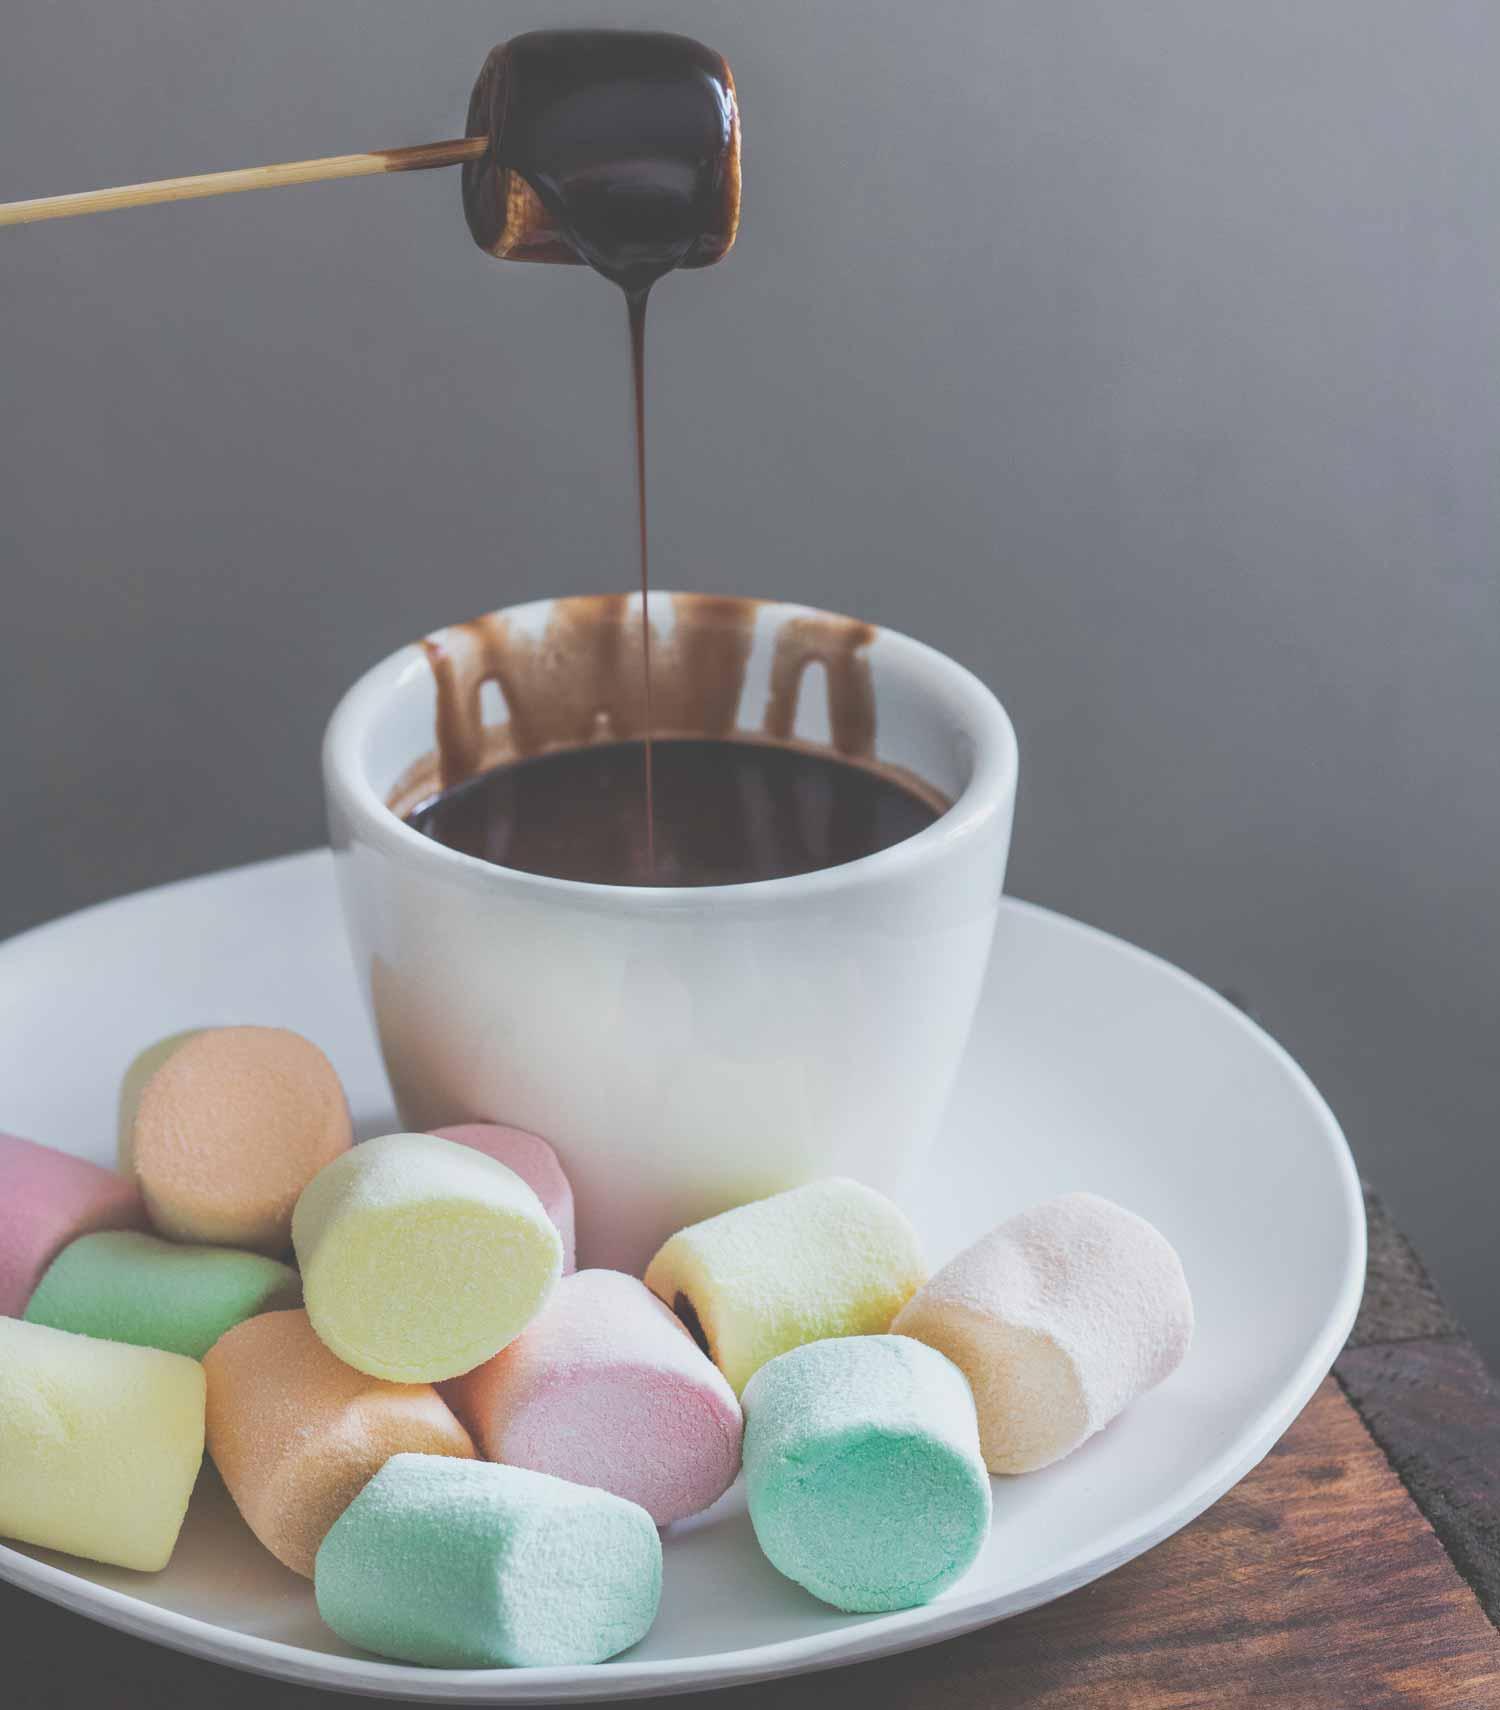 fontaine-a-chocolat-avis